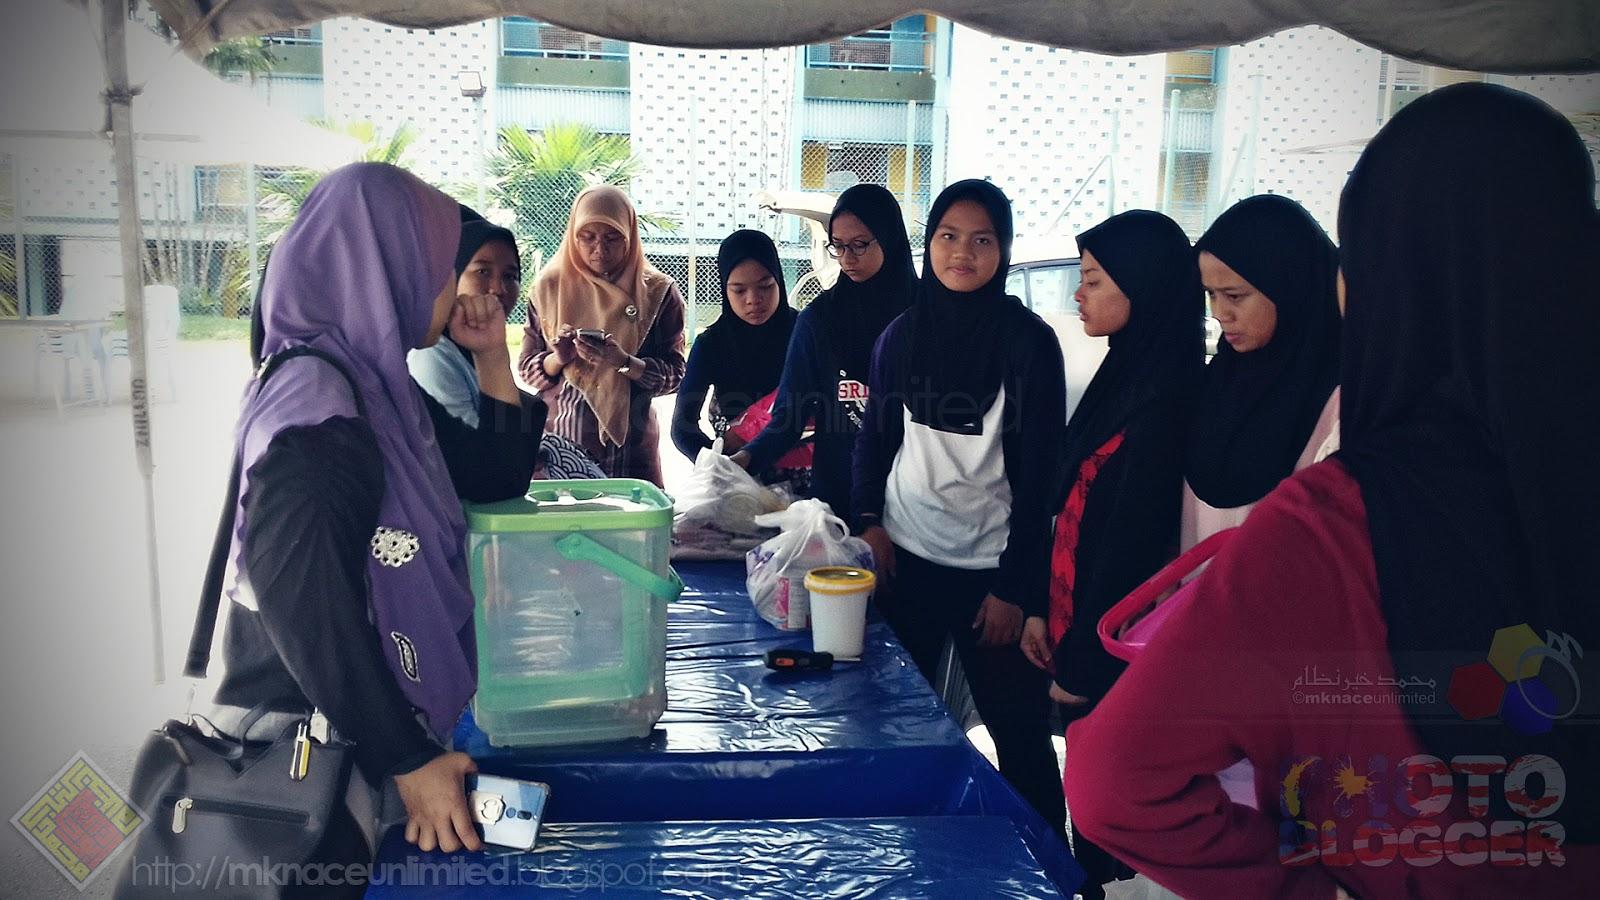 Sekolah Tun Fatimah 20181026 Persediaan Ajk Kerja 3 Setia Program Roti Tissue By Canai Ikhwan Gh Corner Mks